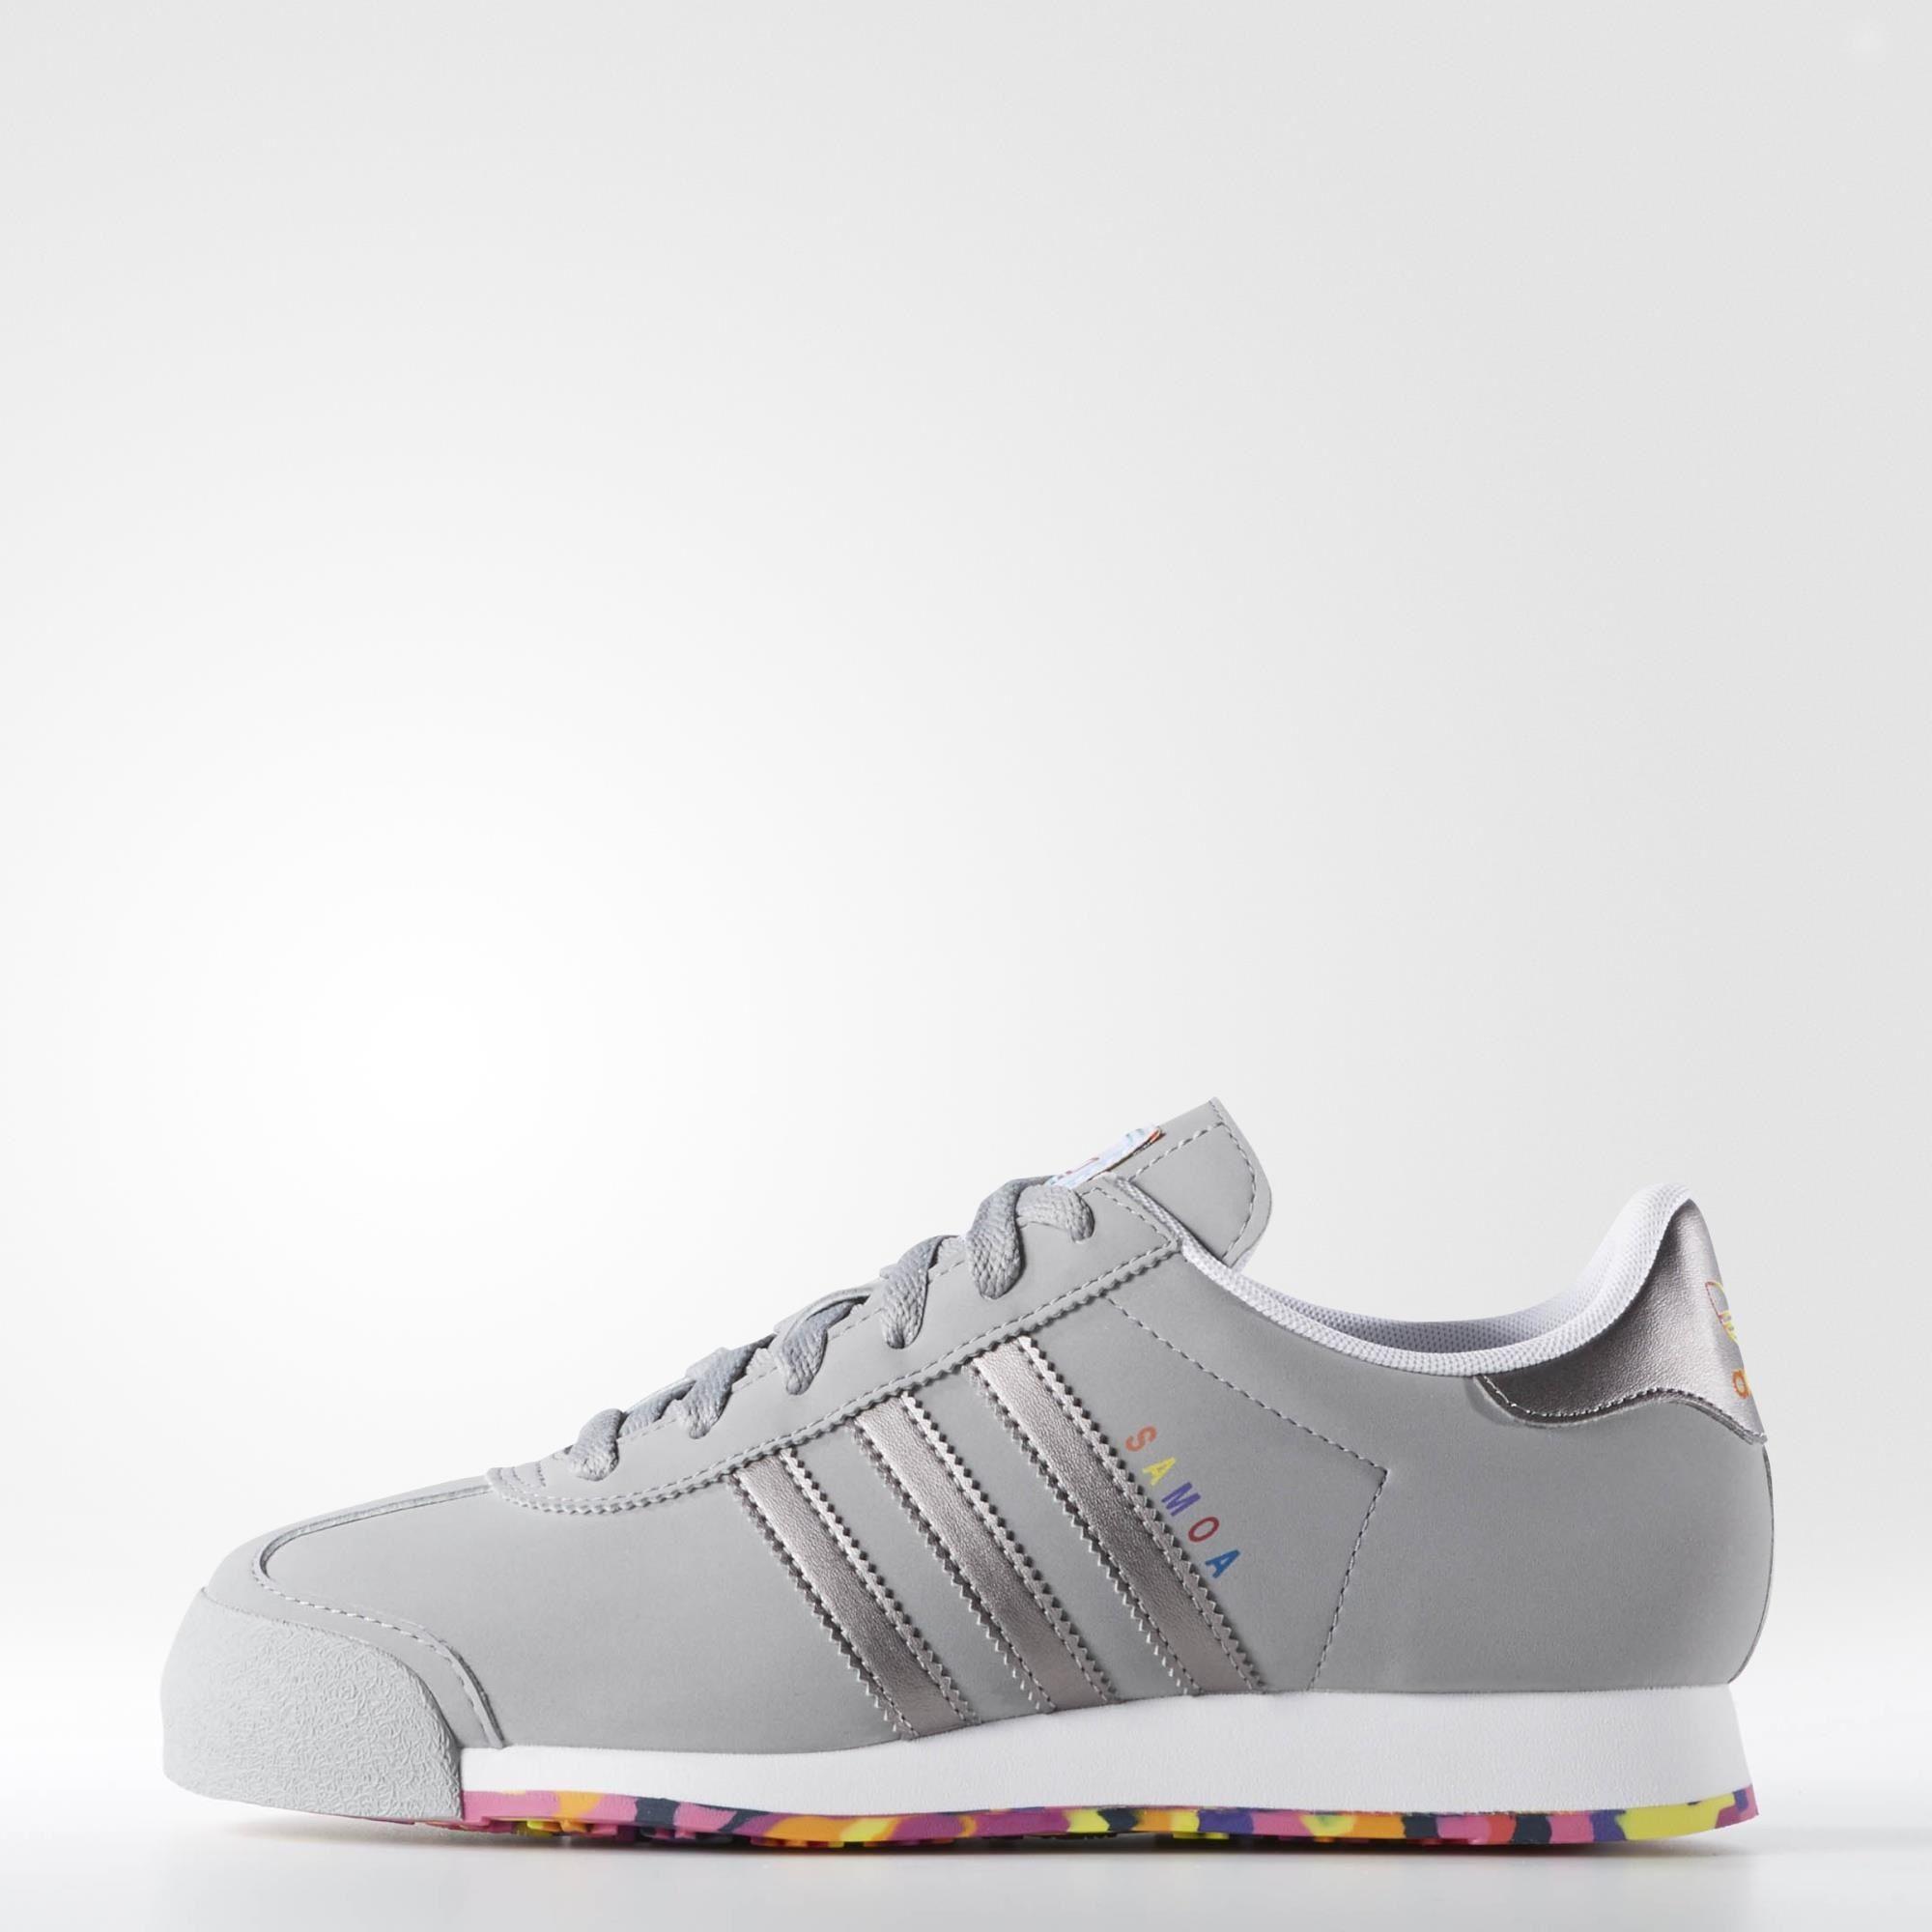 adidas samoa w grey adidas noi ragazzi 2016 pinterest adidas